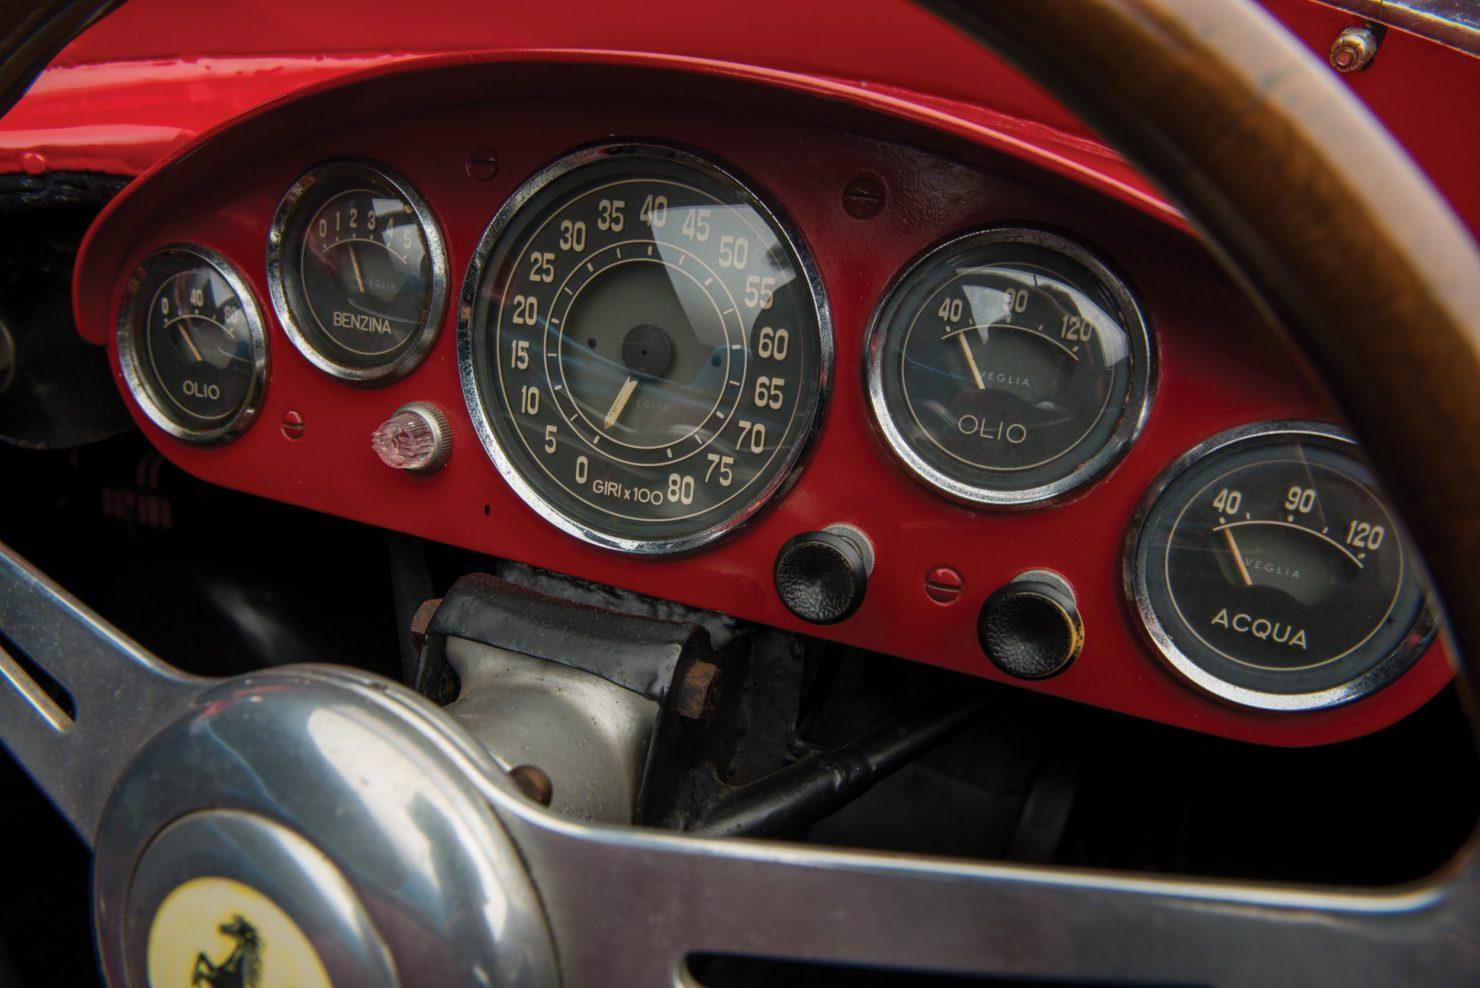 ferrari 121 lm spider 7 1480x988 - 1955 Ferrari 121 LM